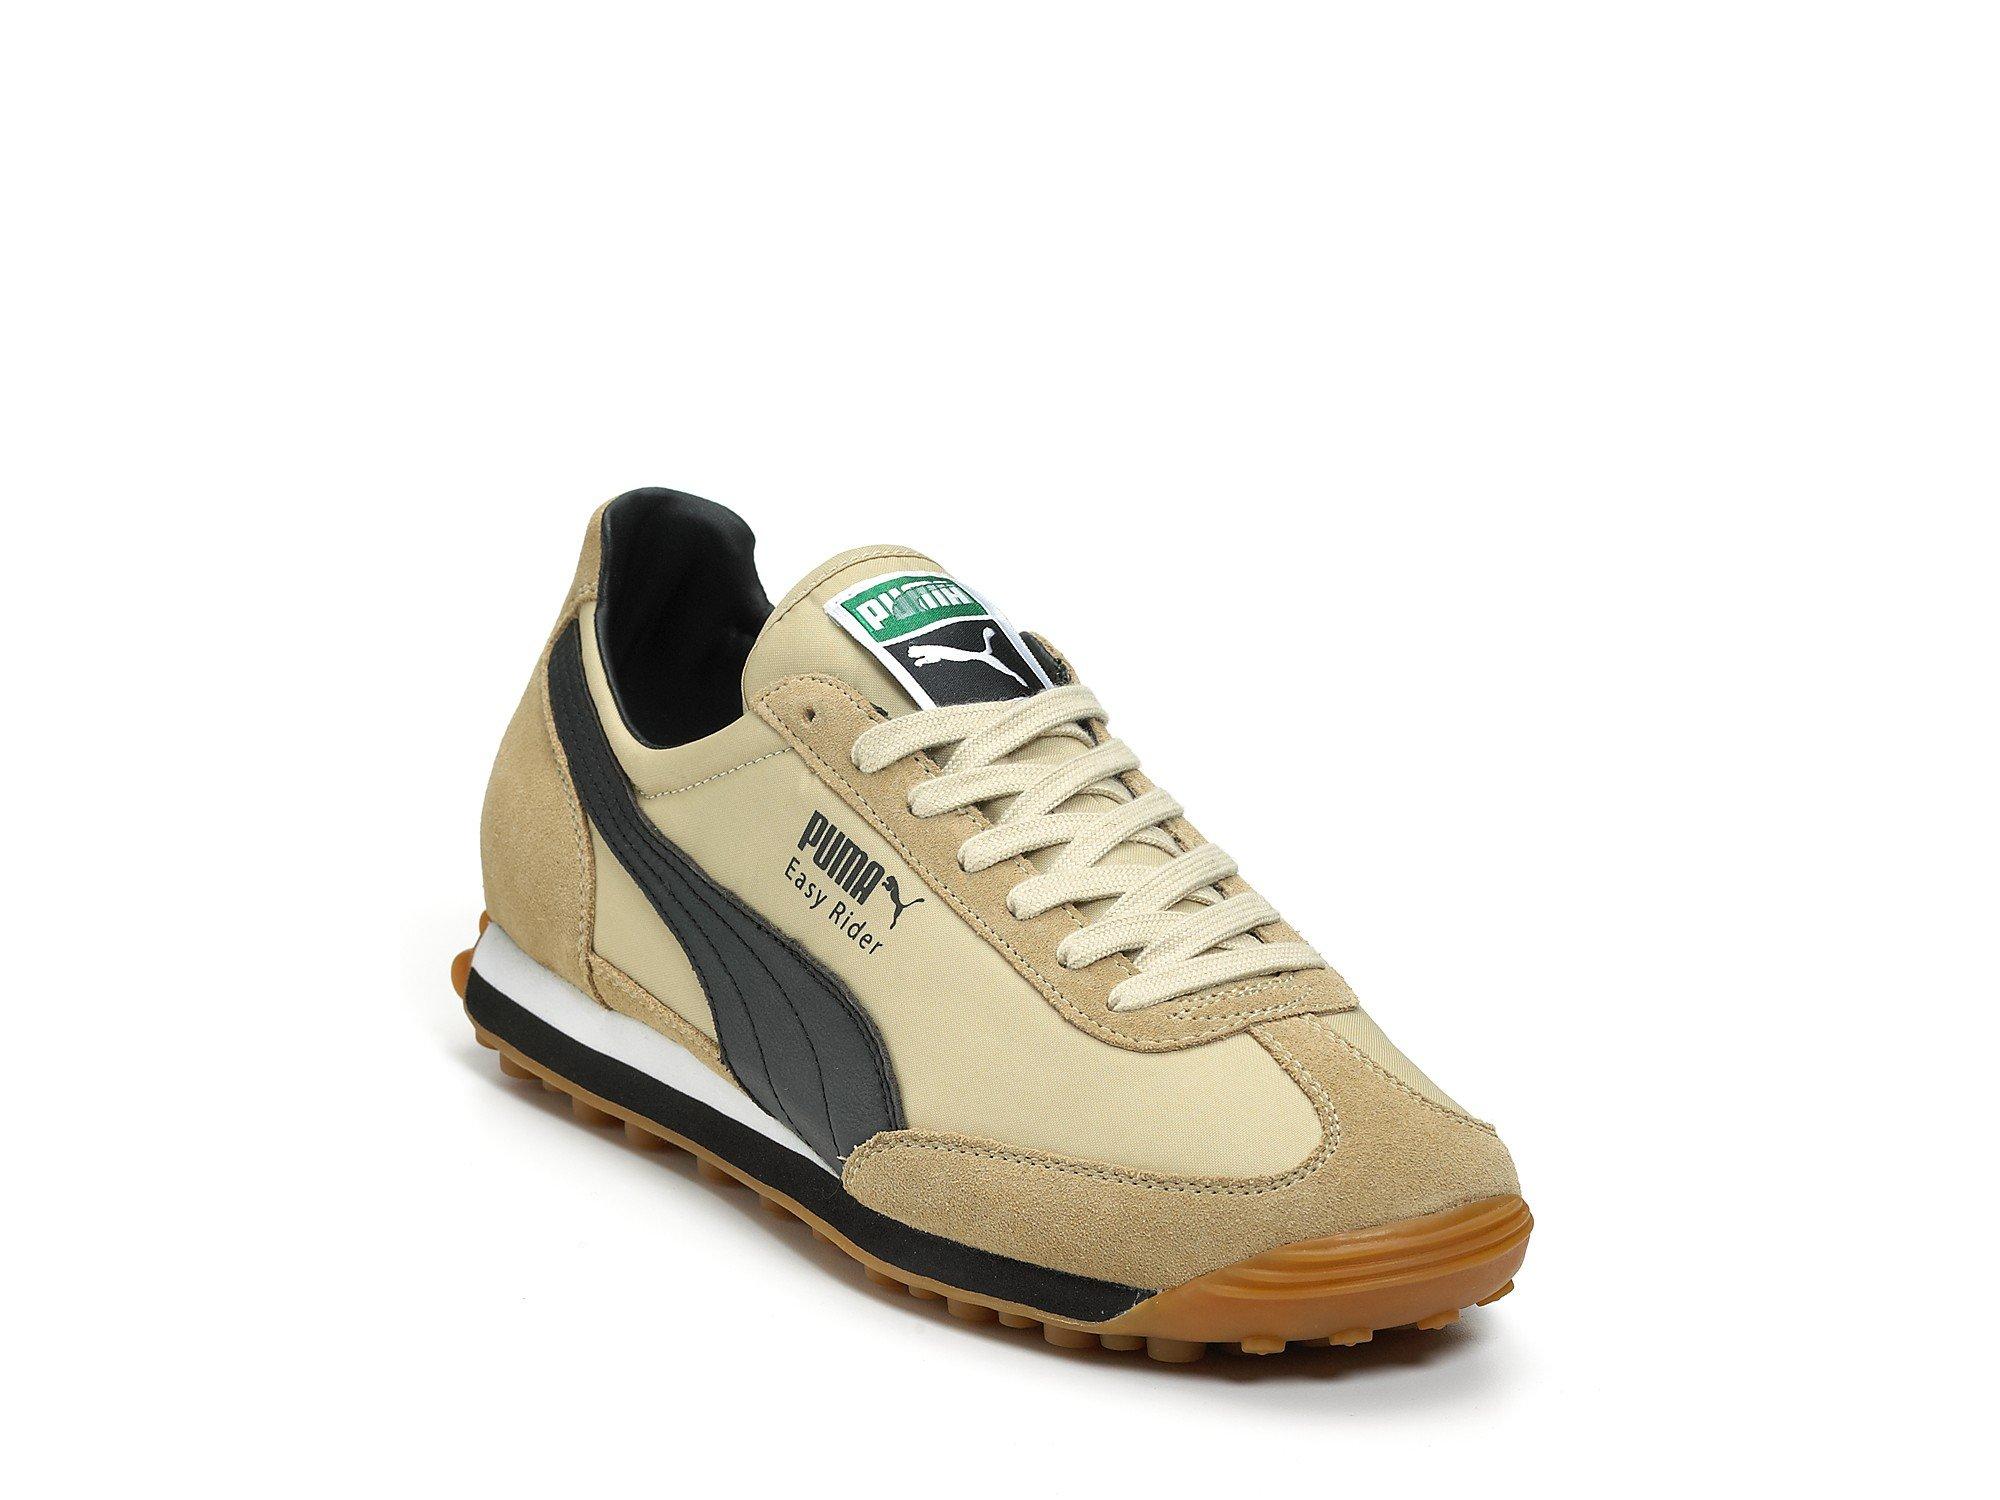 PUMA Natural Easy Rider 78 Sneaker for men